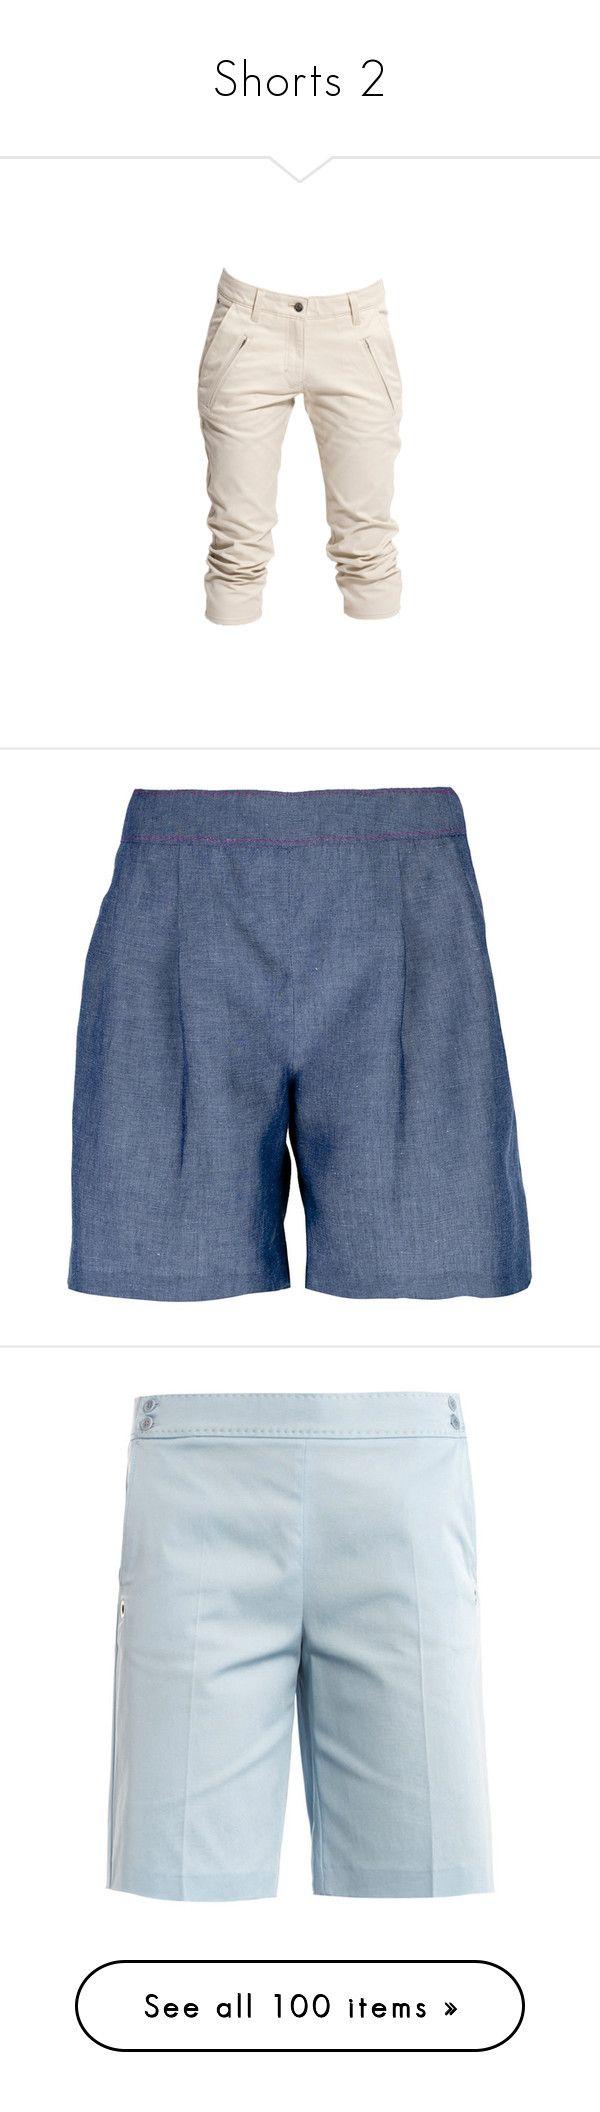 """Shorts 2"" by maggie-jackson-carvalho ❤ liked on Polyvore featuring pants, shorts, jeans, bottoms, pantalones, adidas, grey, grey high waisted shorts, gray shorts and short shorts"